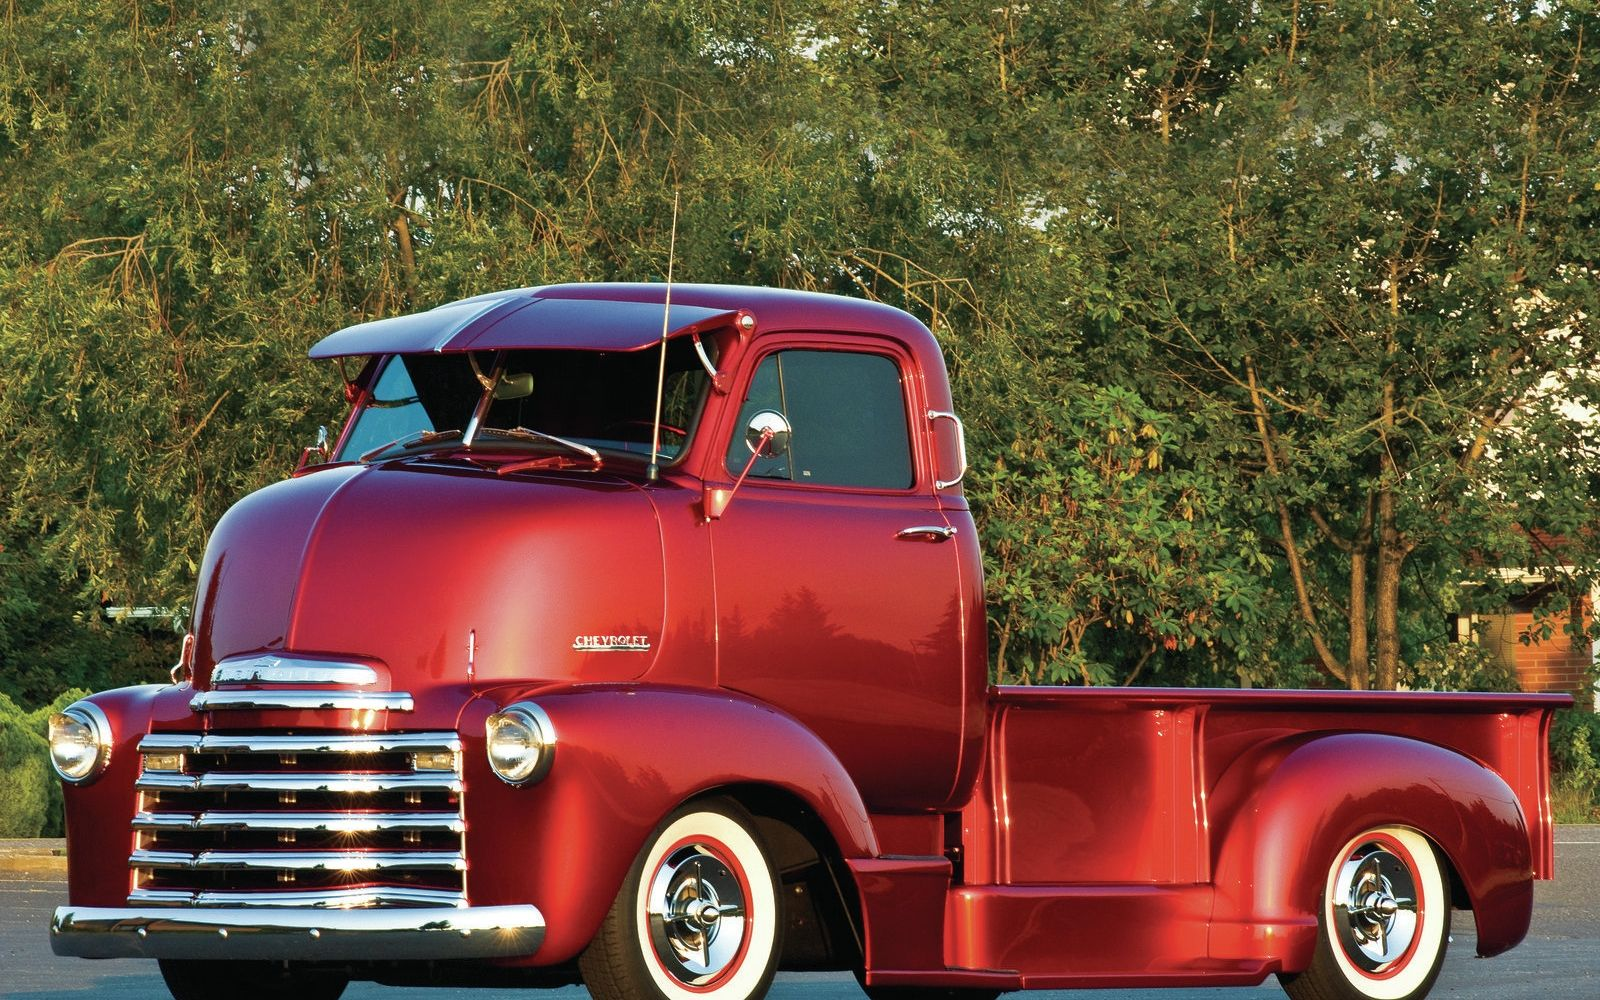 afficher l 39 image d 39 origine voiture ancienne voitures anciennes et voiture. Black Bedroom Furniture Sets. Home Design Ideas